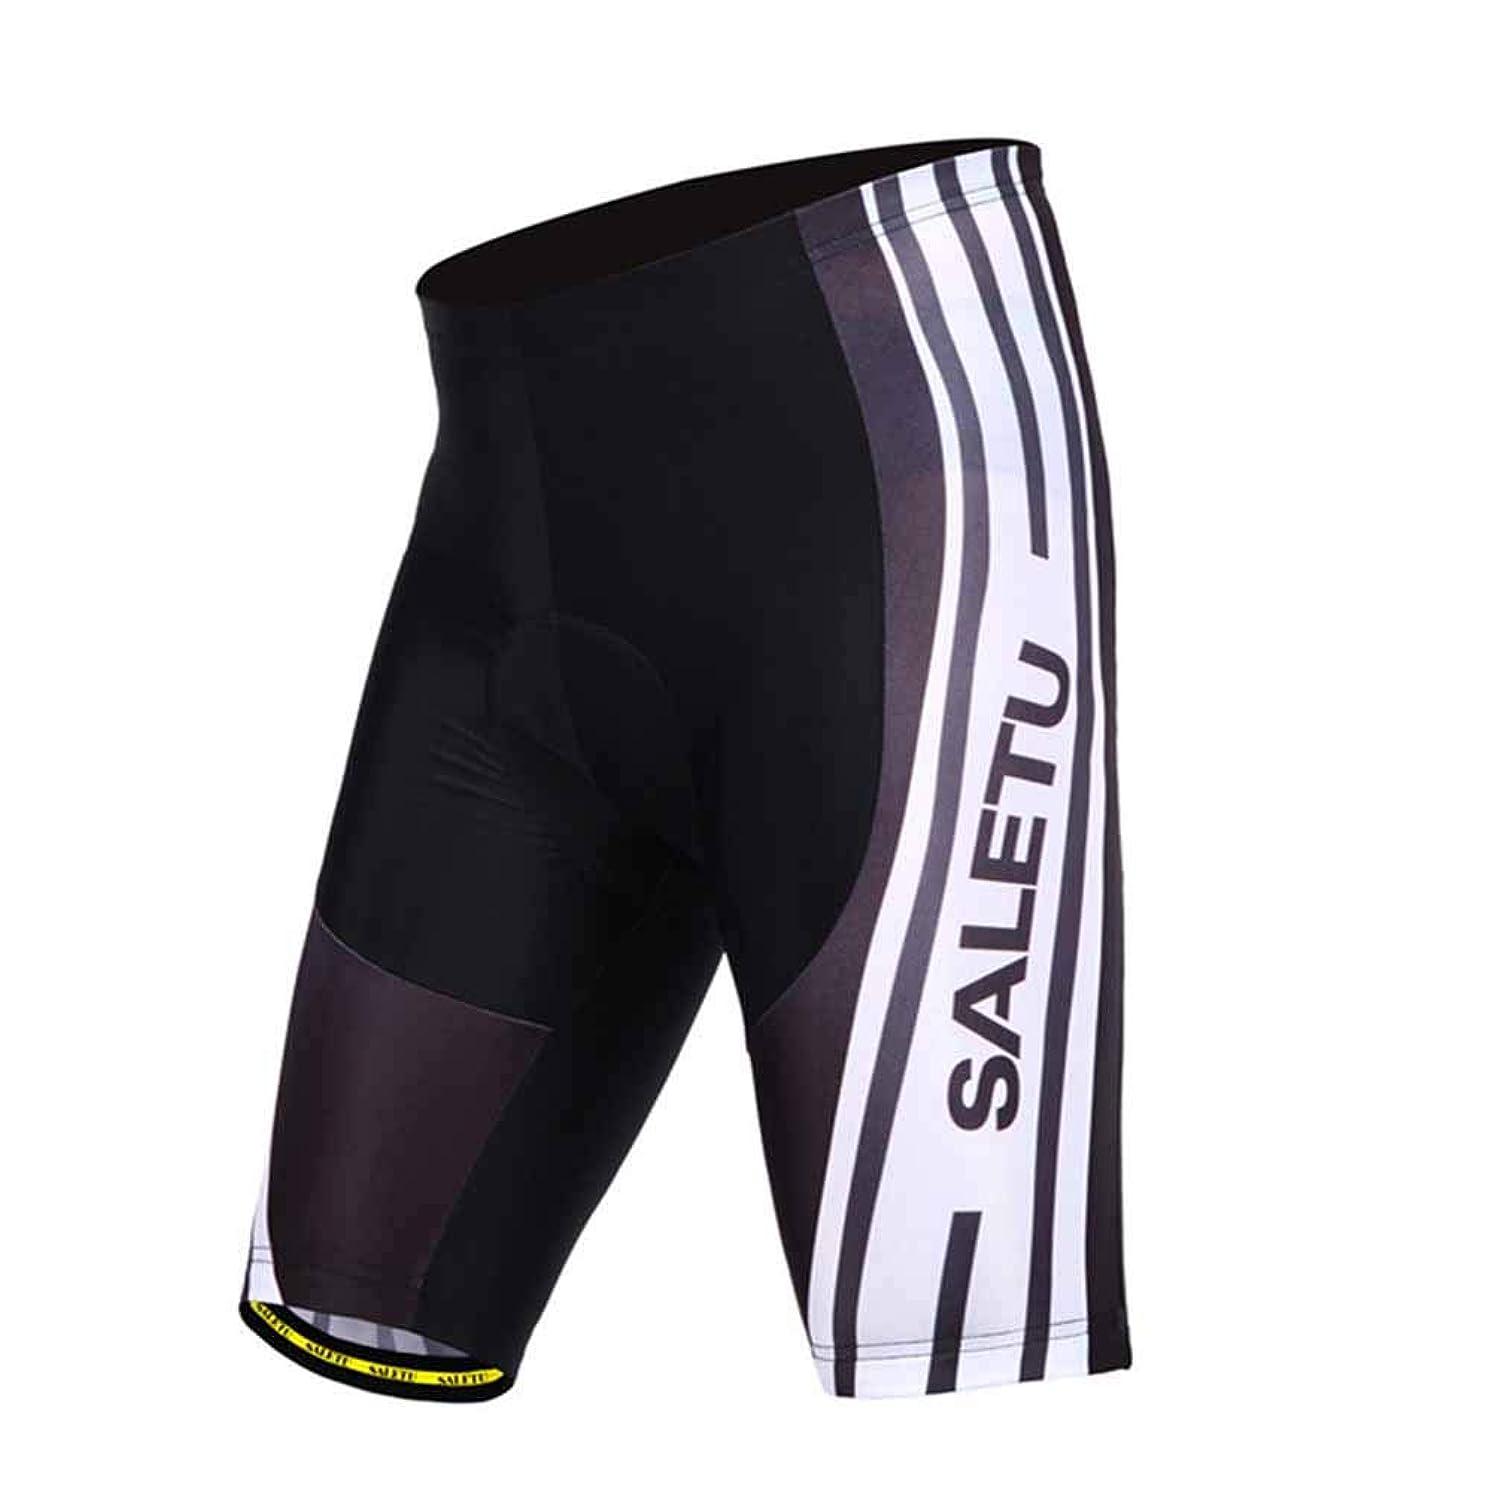 Mens Cycling Shorts,Mens Padded Cycling Shorts,Shockproof Cycling Shorts, Lycra, Comfortable, Wicking Moisture, Quick Drying